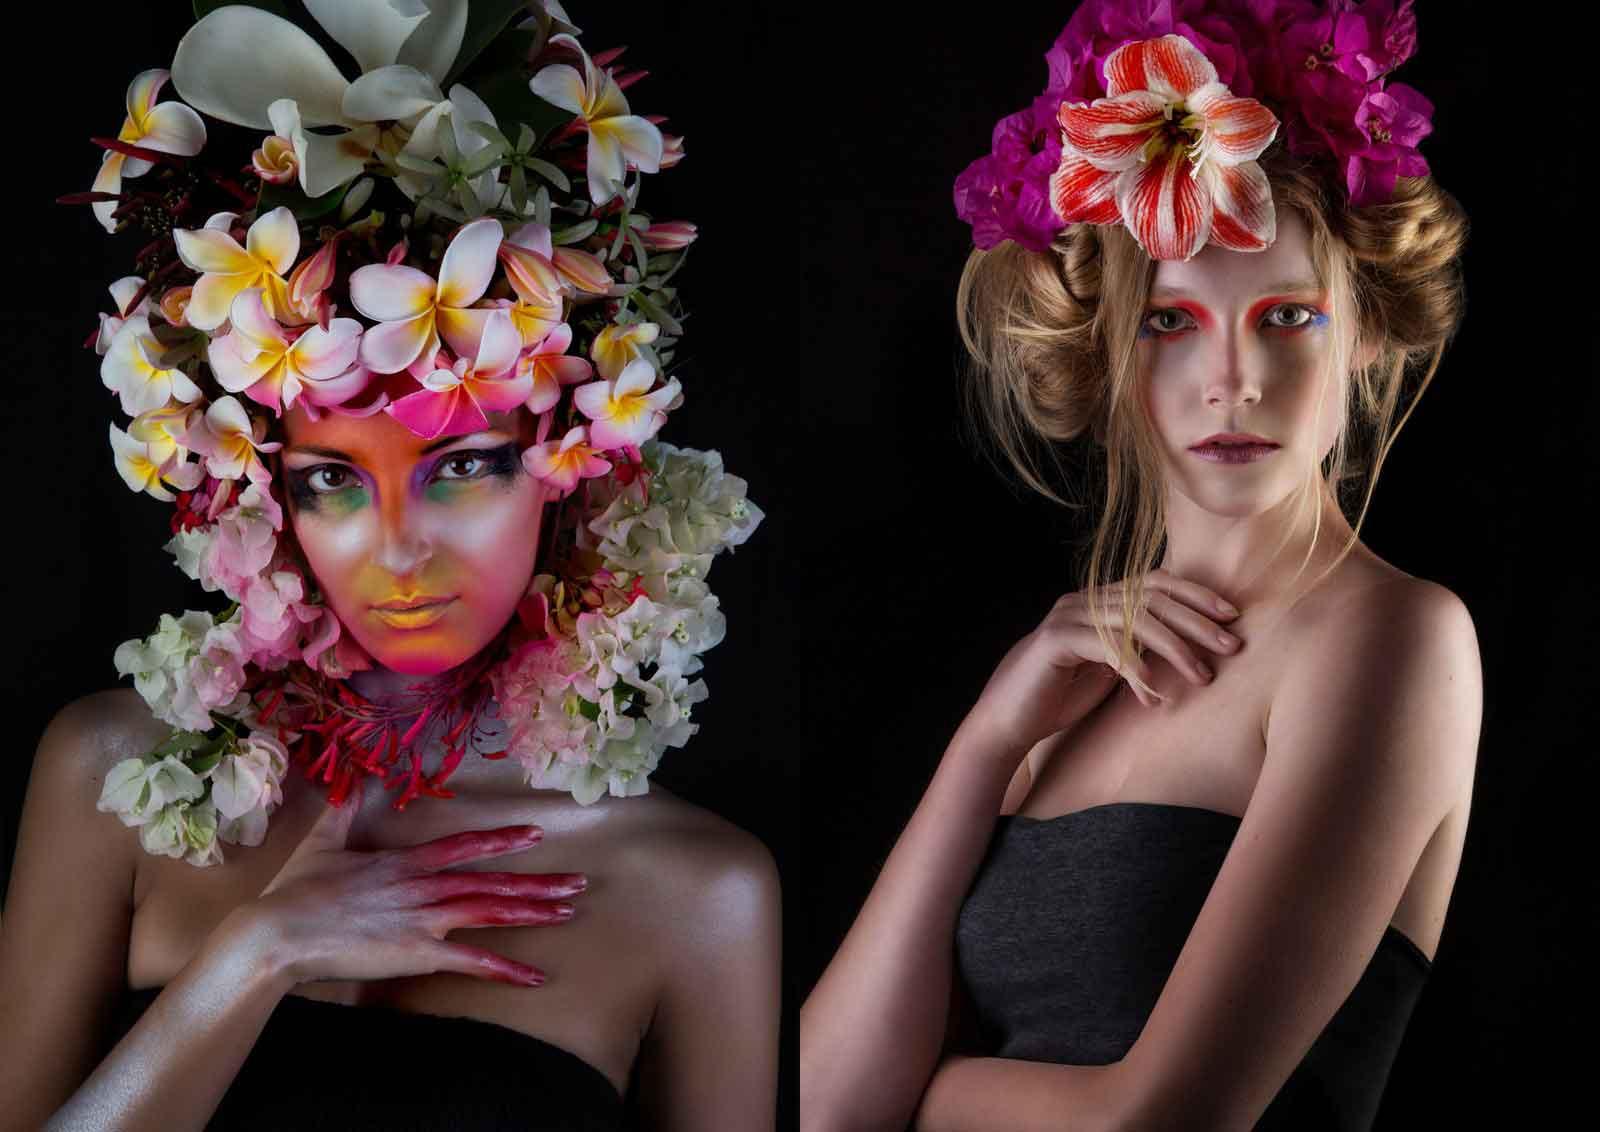 creative beauty art photography